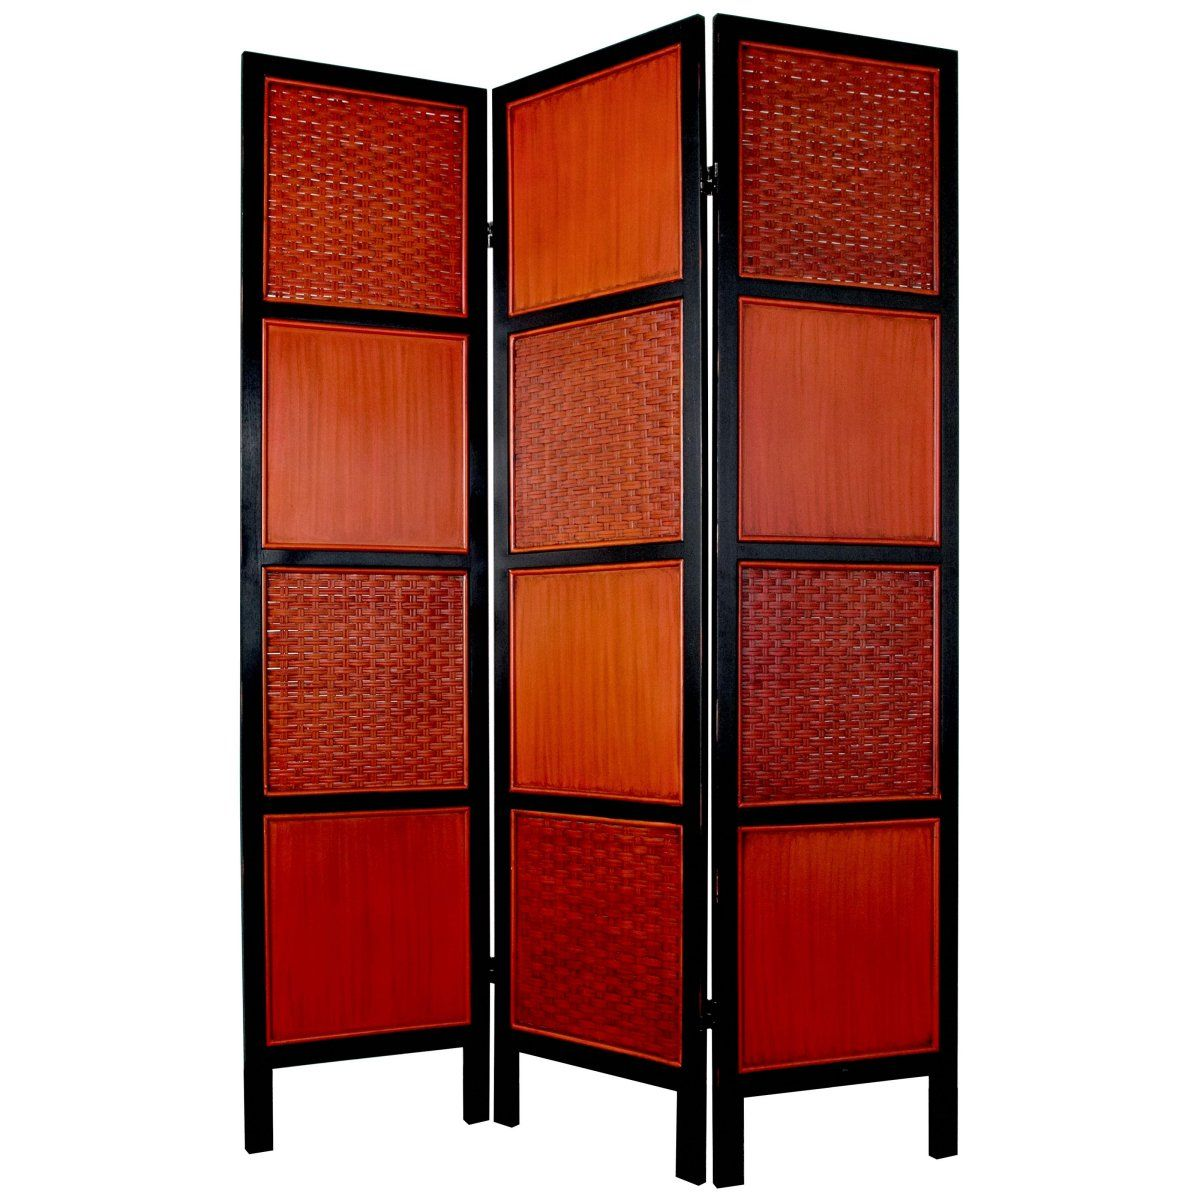 Oriental furniture tainan screen room dividerred woven rattan